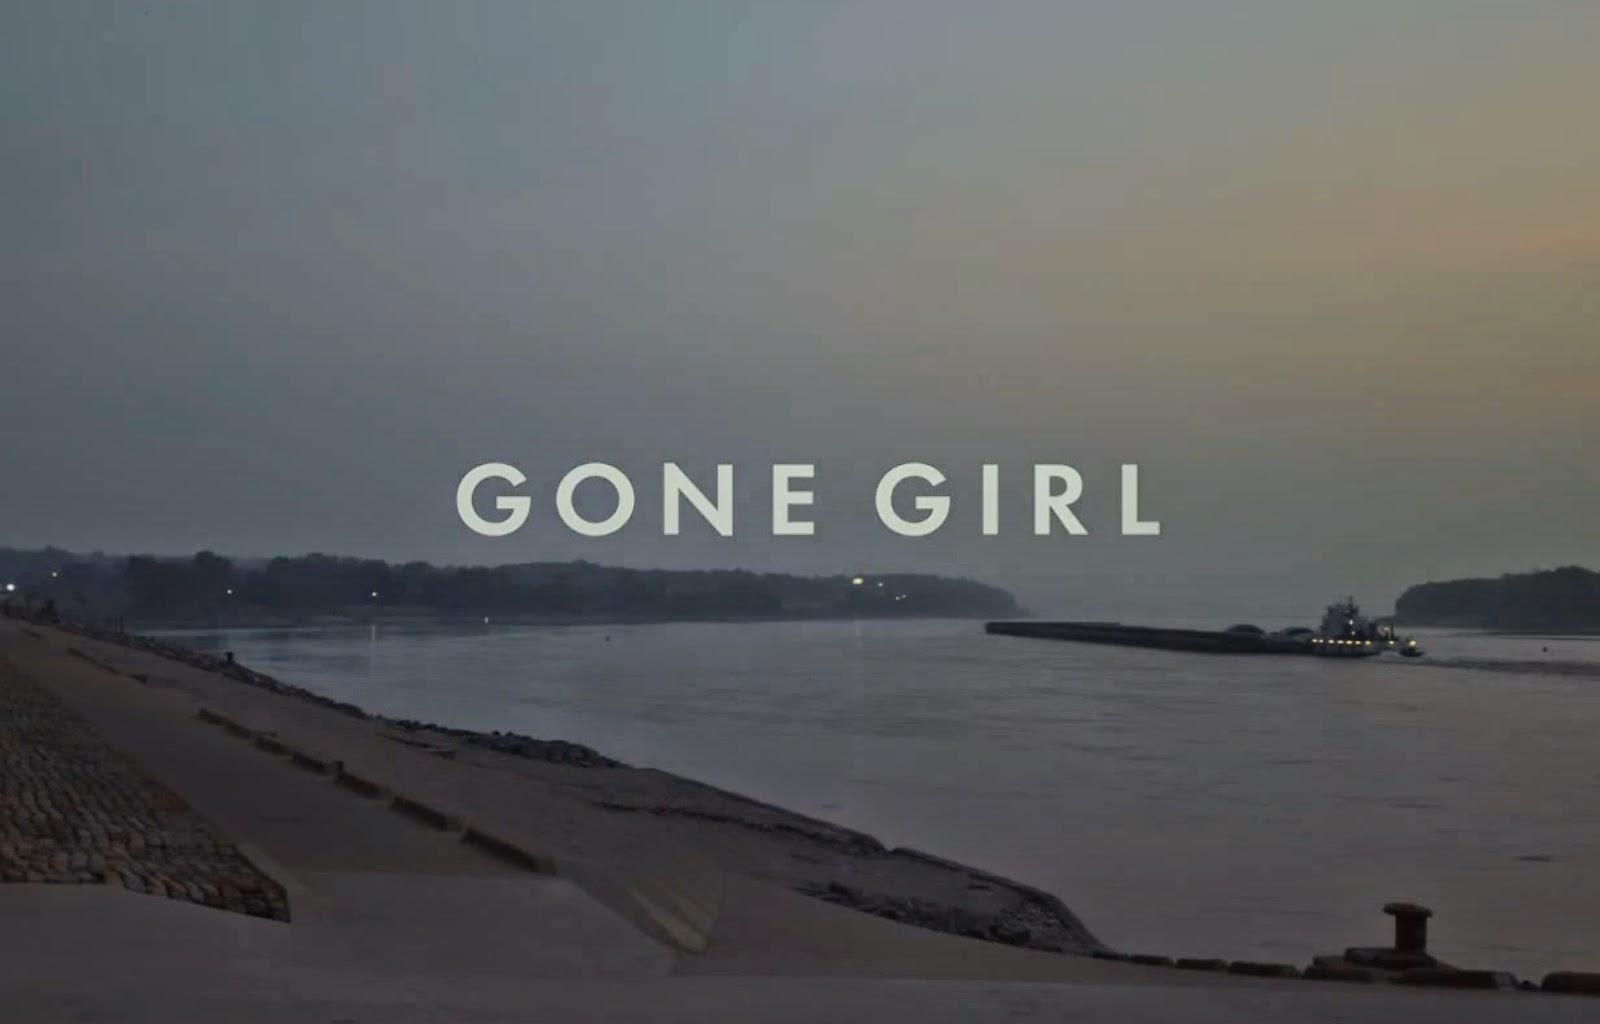 Frases de la película Gone Girl